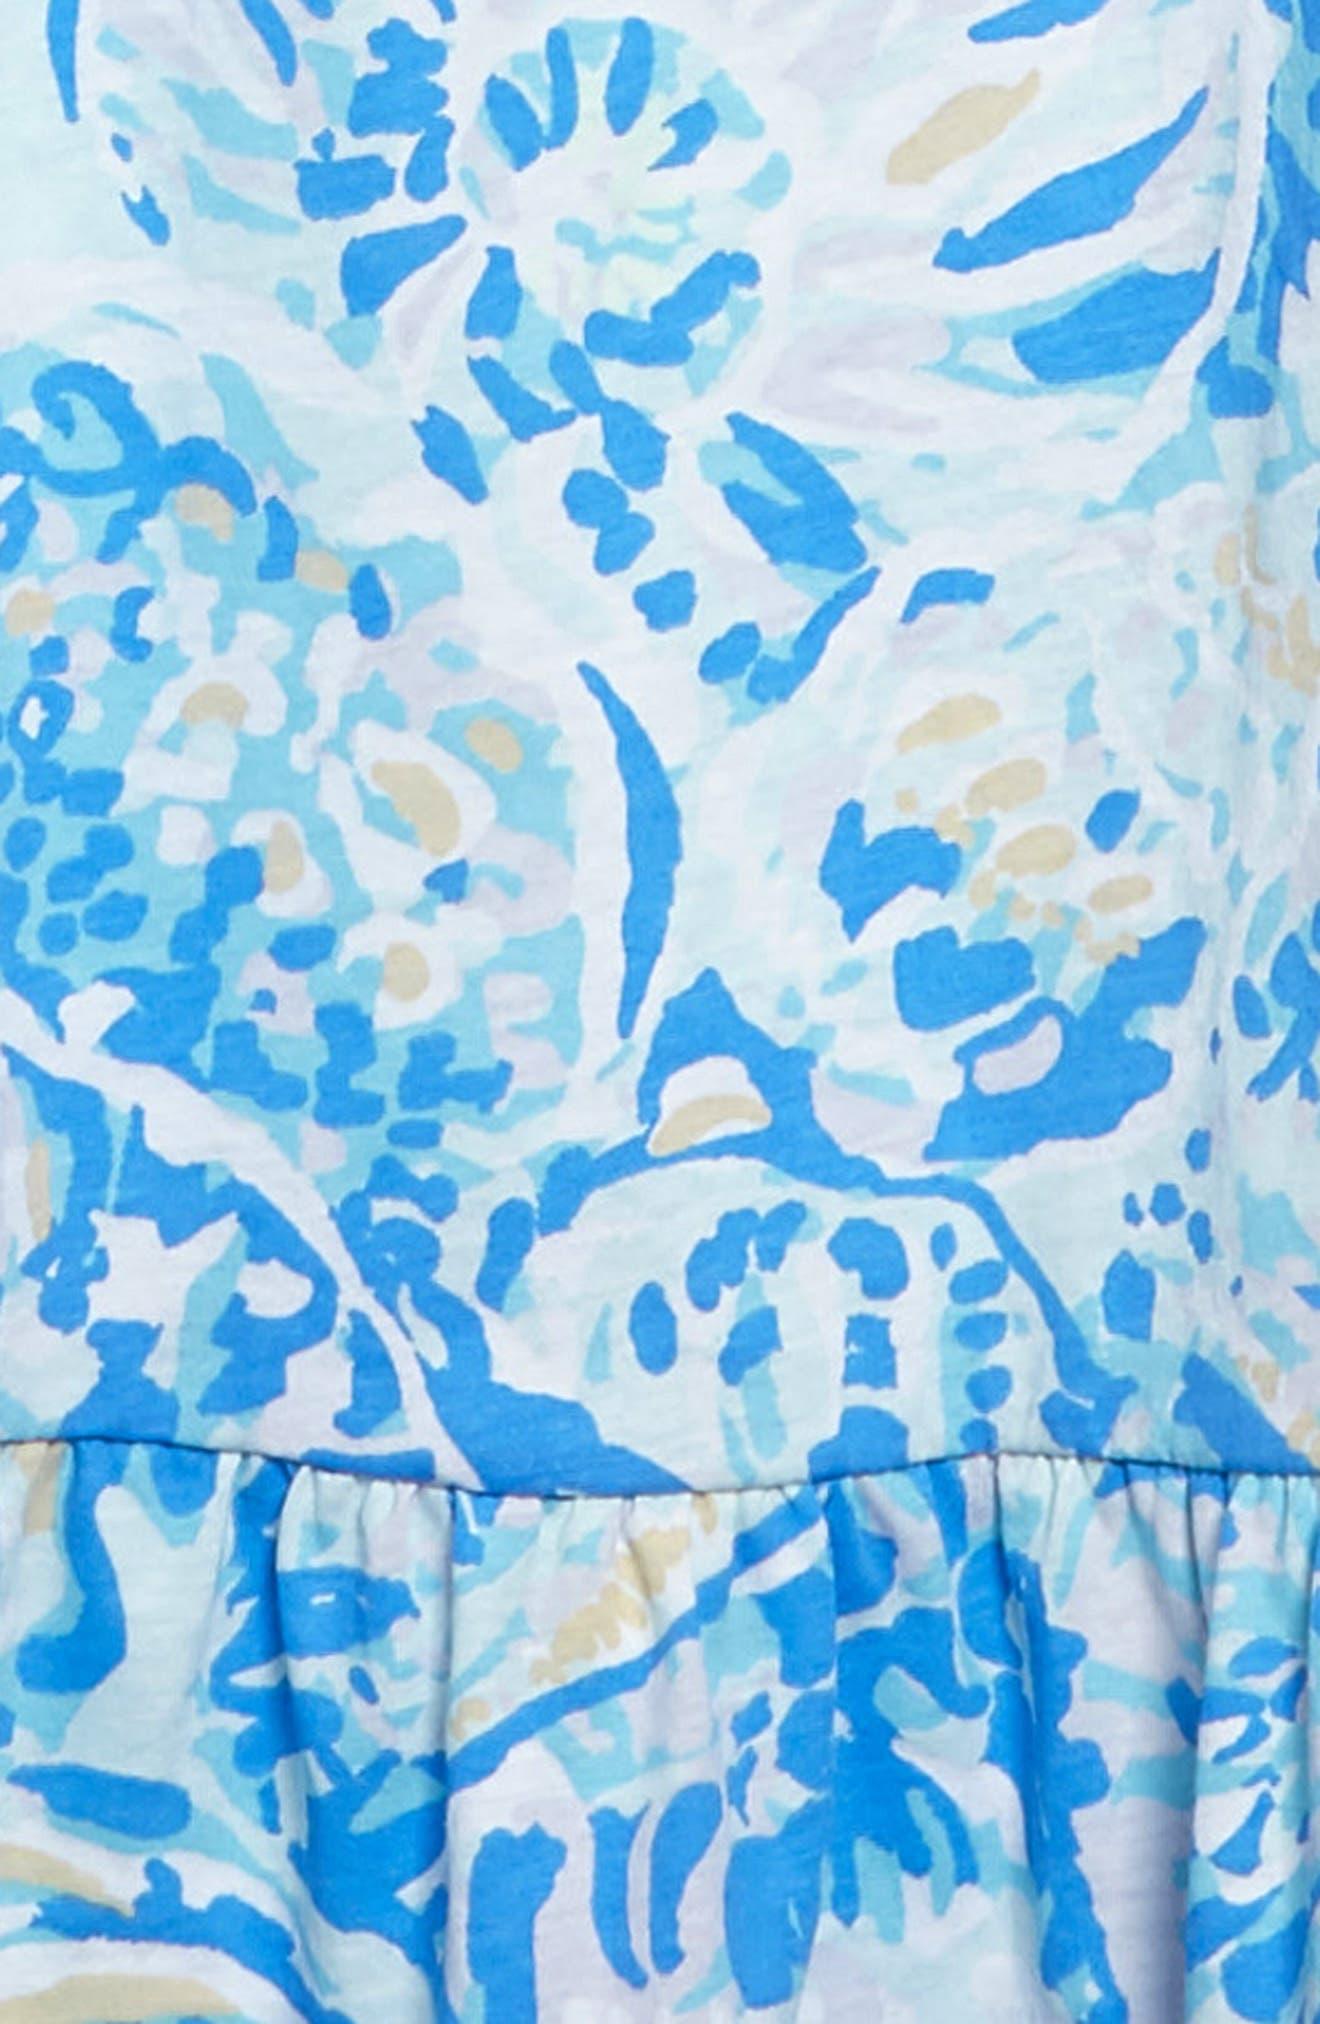 Clary Cold Shoulder Maxi Dress,                             Alternate thumbnail 3, color,                             Bennet Blue Salty Seas